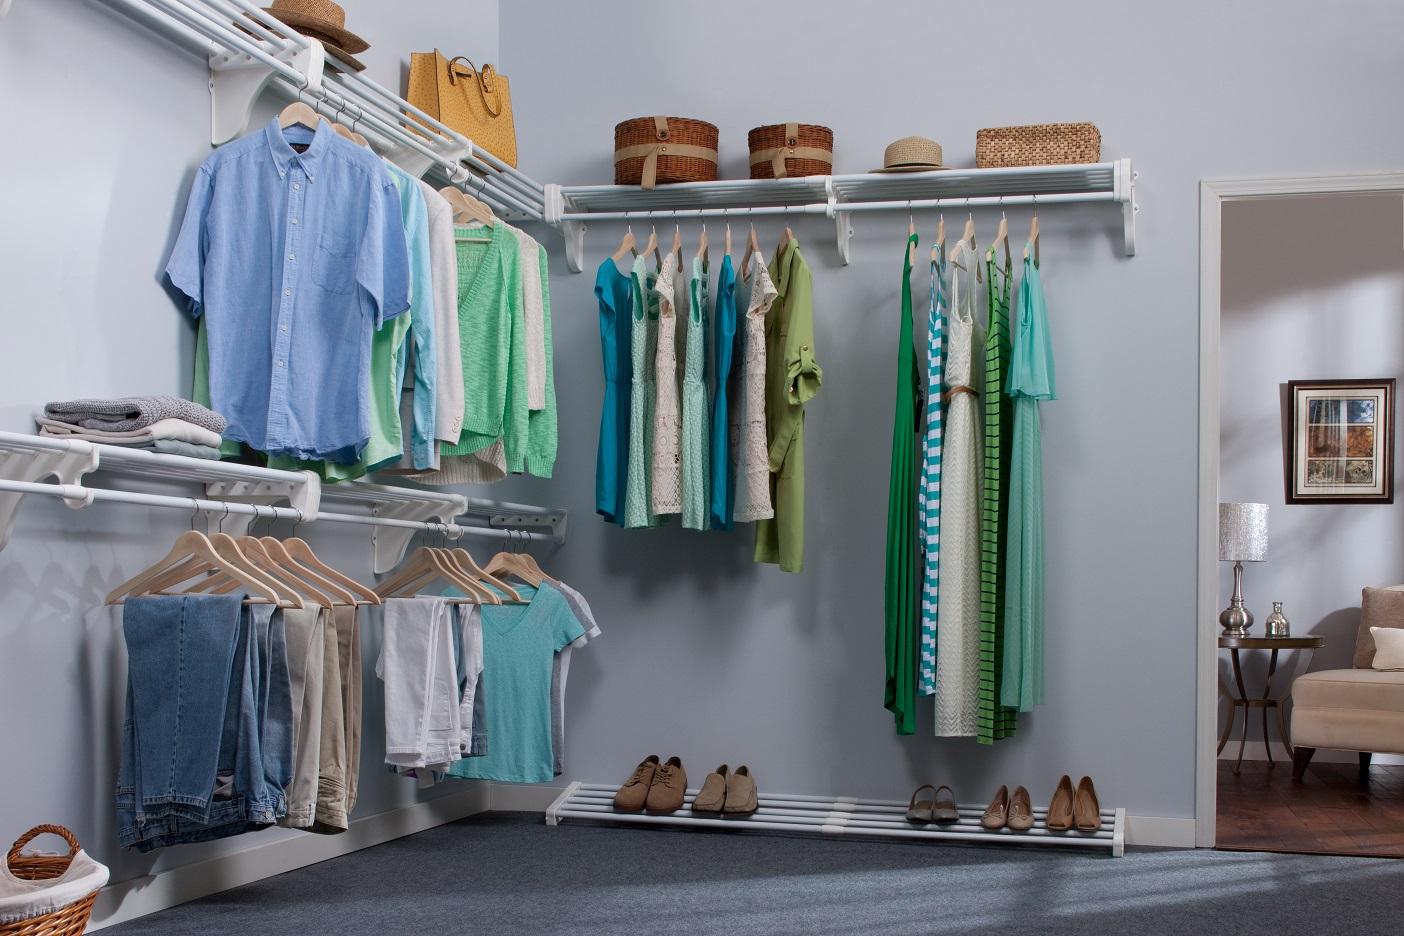 Home Depot Online Is Now Selling Ez Shelf Closet